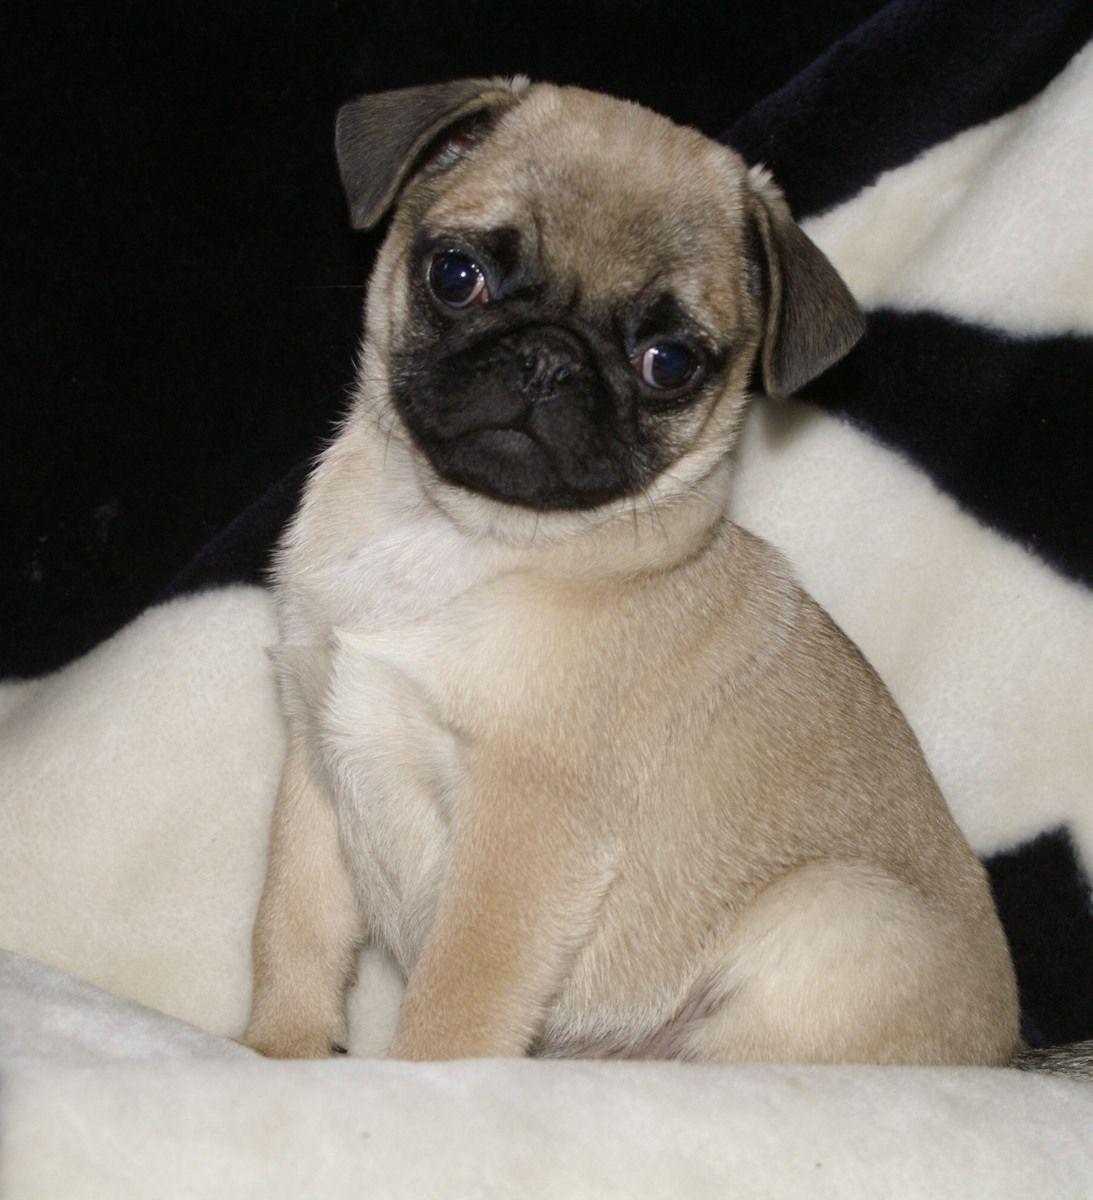 Cute Lil Puppy Pug Baby Pugs Pugs Pug Love